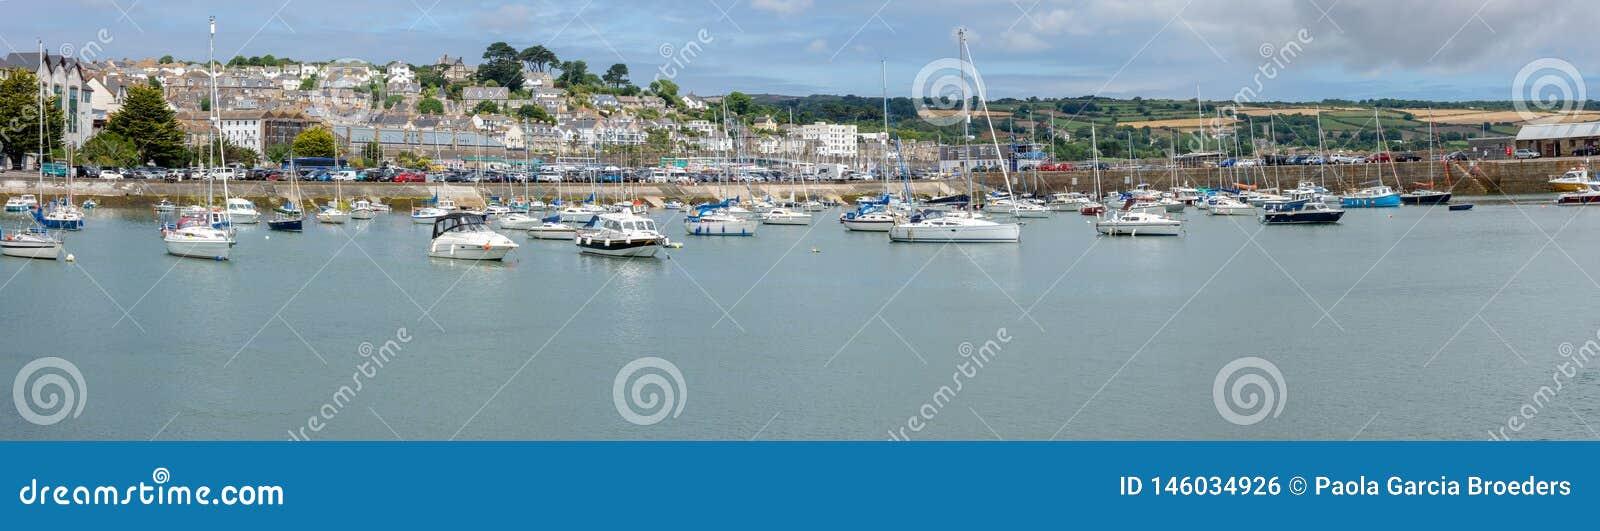 Pano de port de Penzance, les Cornouailles Angleterre R-U